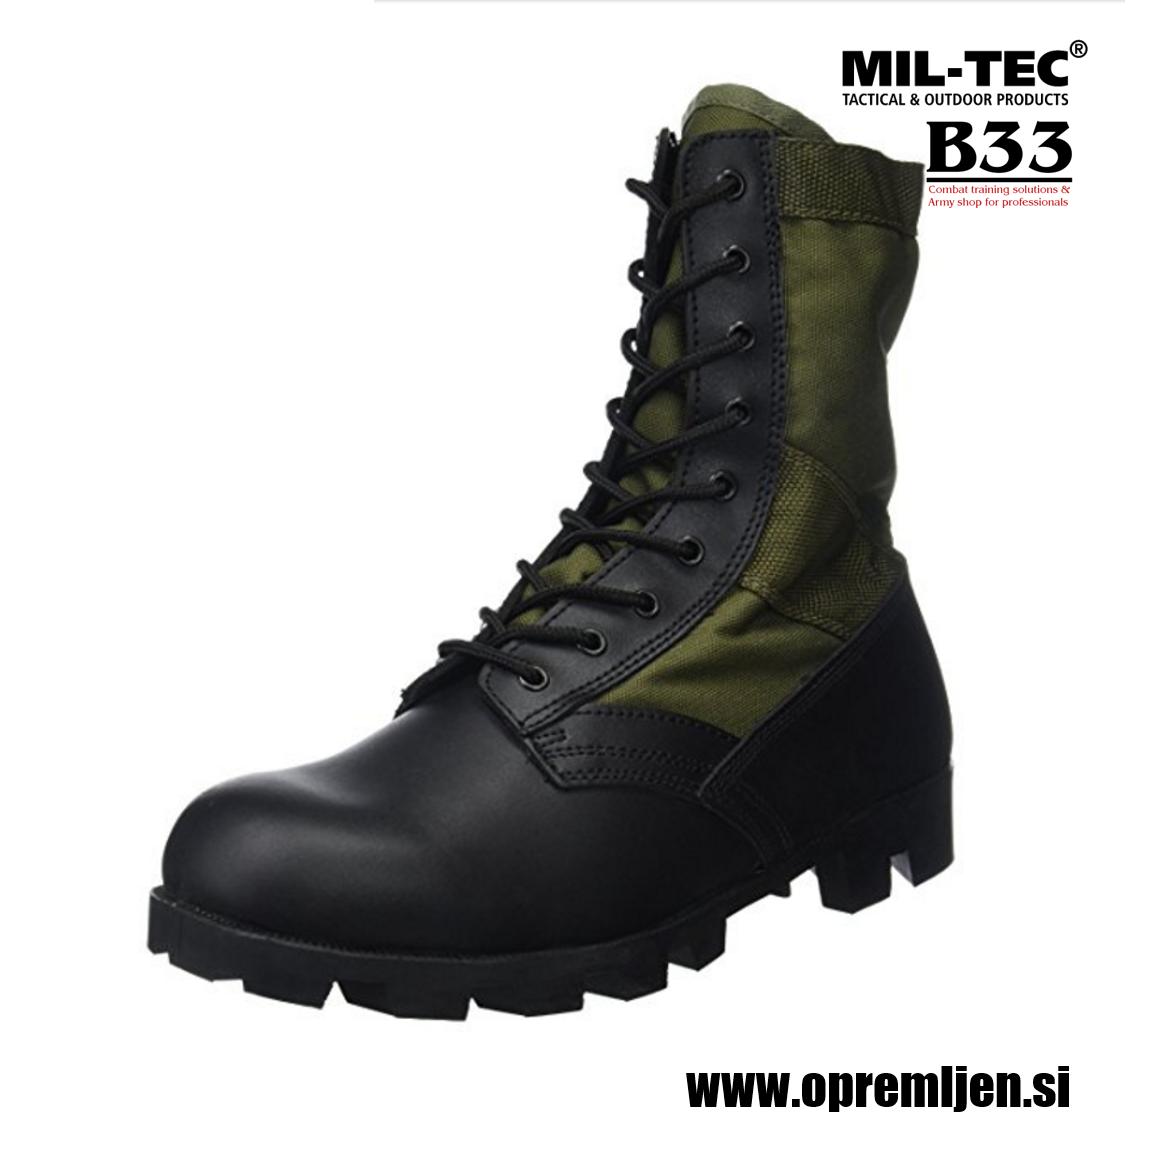 B33 army shop - vojaška obutev, vojaški škornji US Panama, vojaški škorenj US Panama, vojaška trgovina, trgovina z vojaško opremo